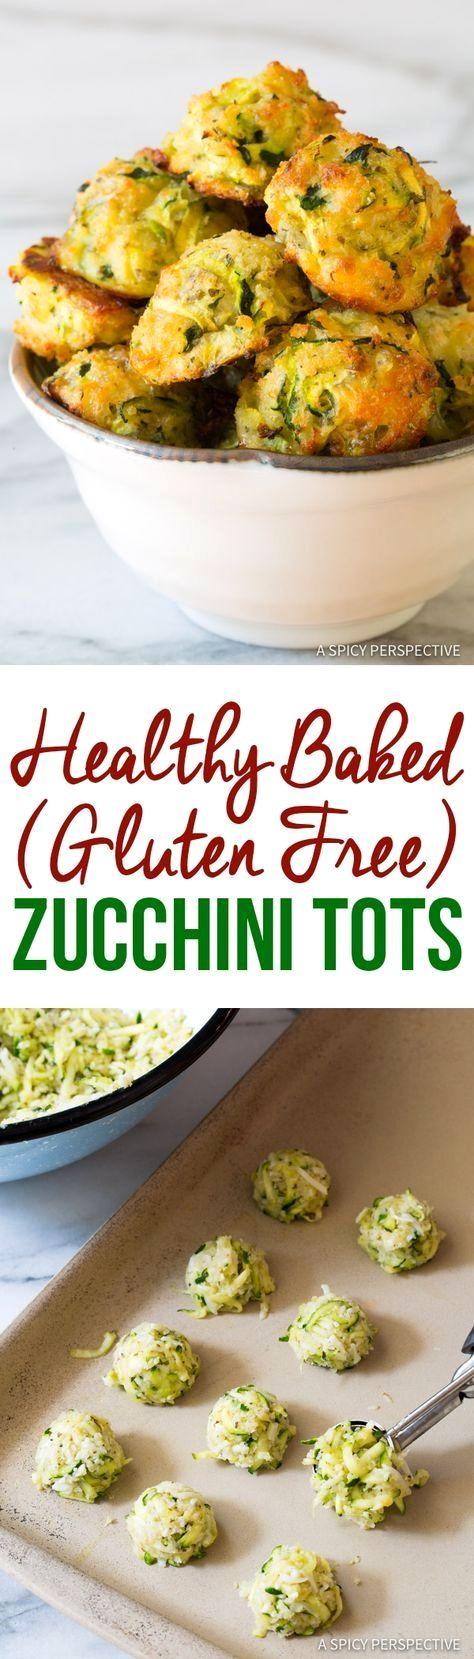 6-Ingredient Healthy Baked Zucchini Tots (Gluten Free!) | http://ASpicyPerspective.com